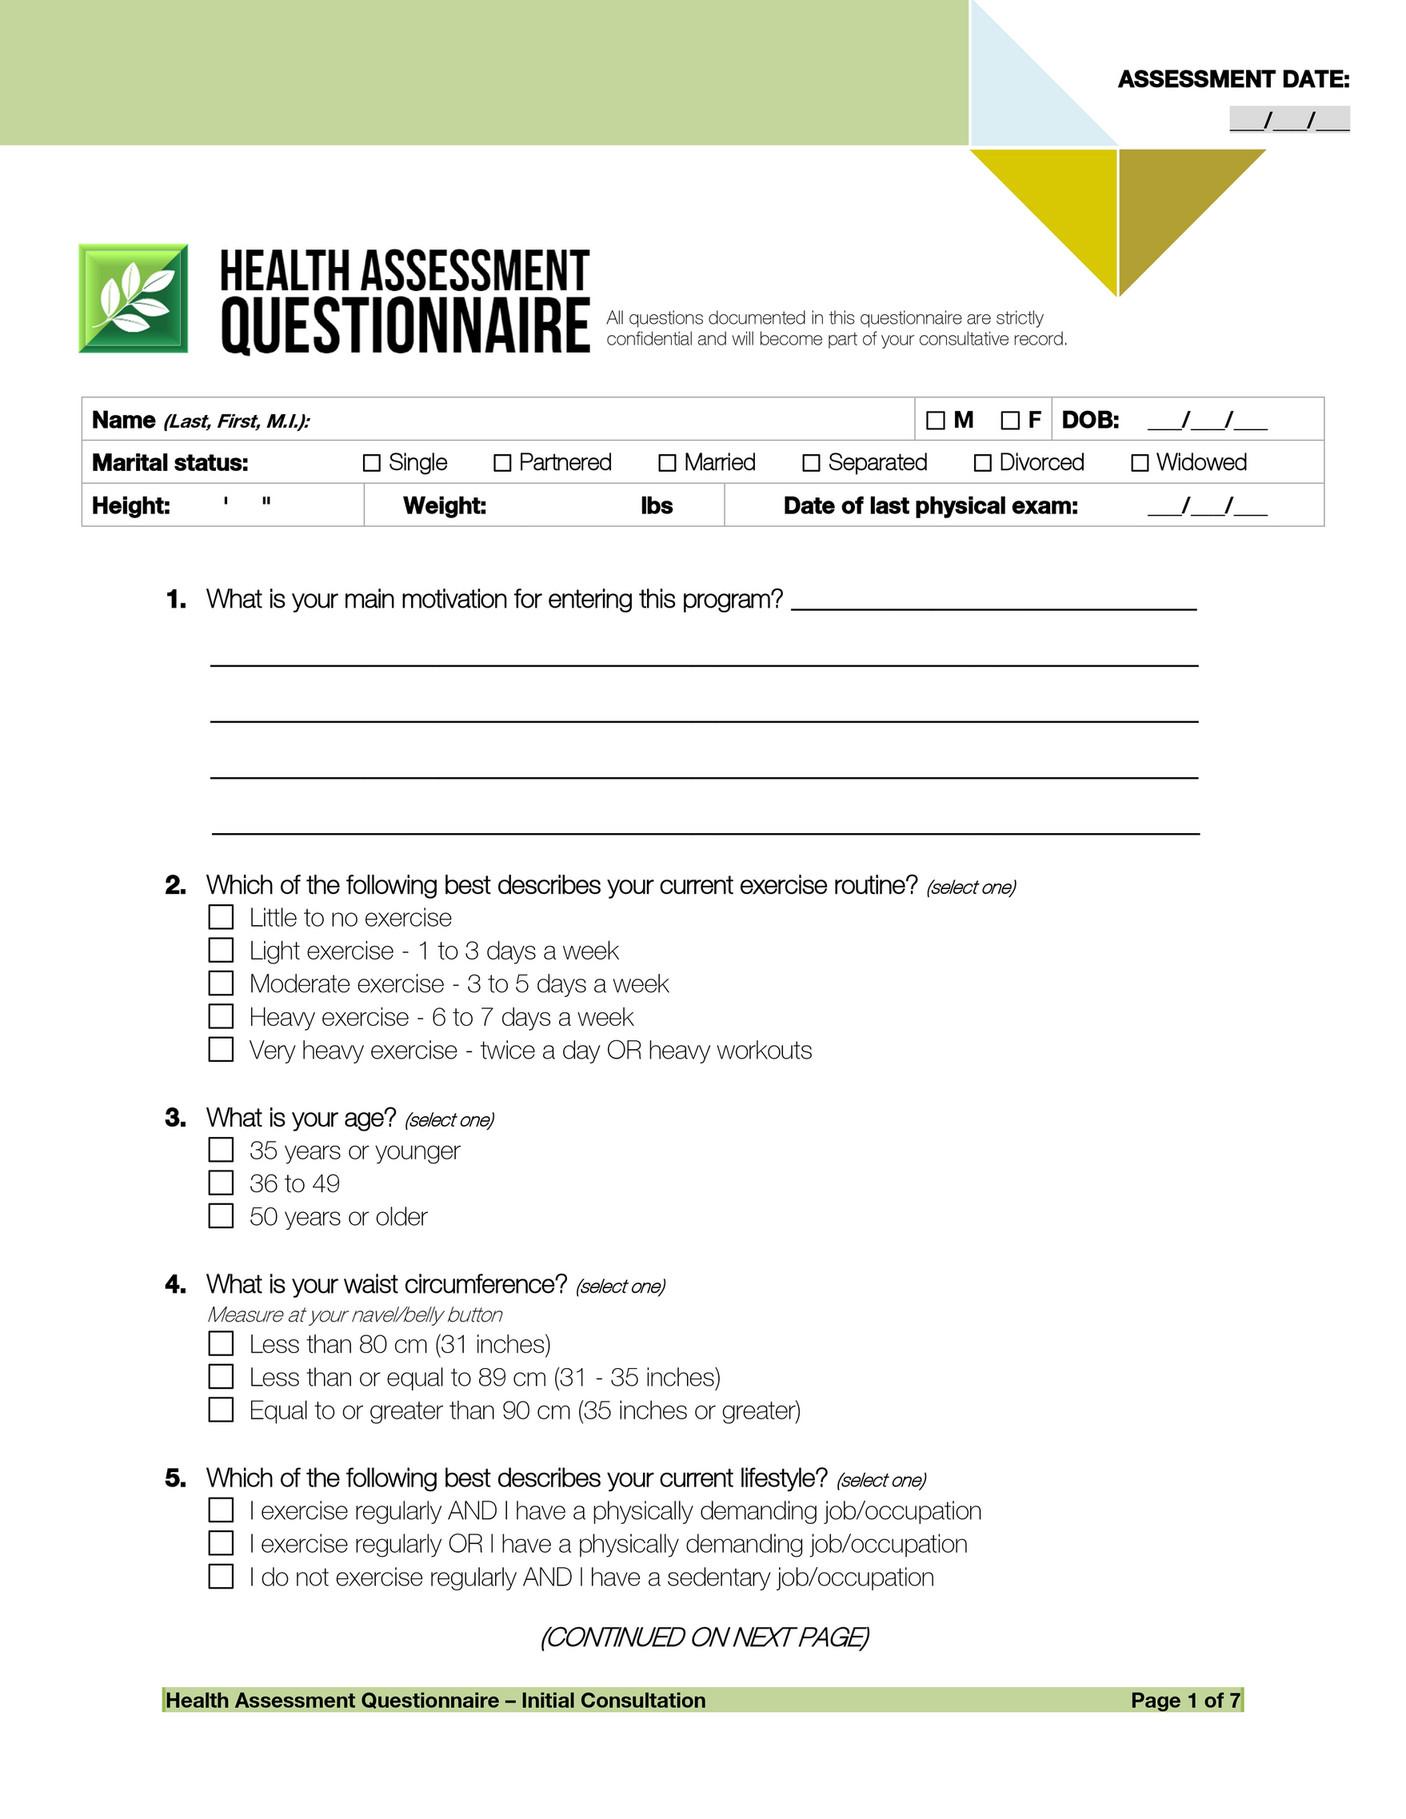 Trinh International - Health Assessment Form - Page 1